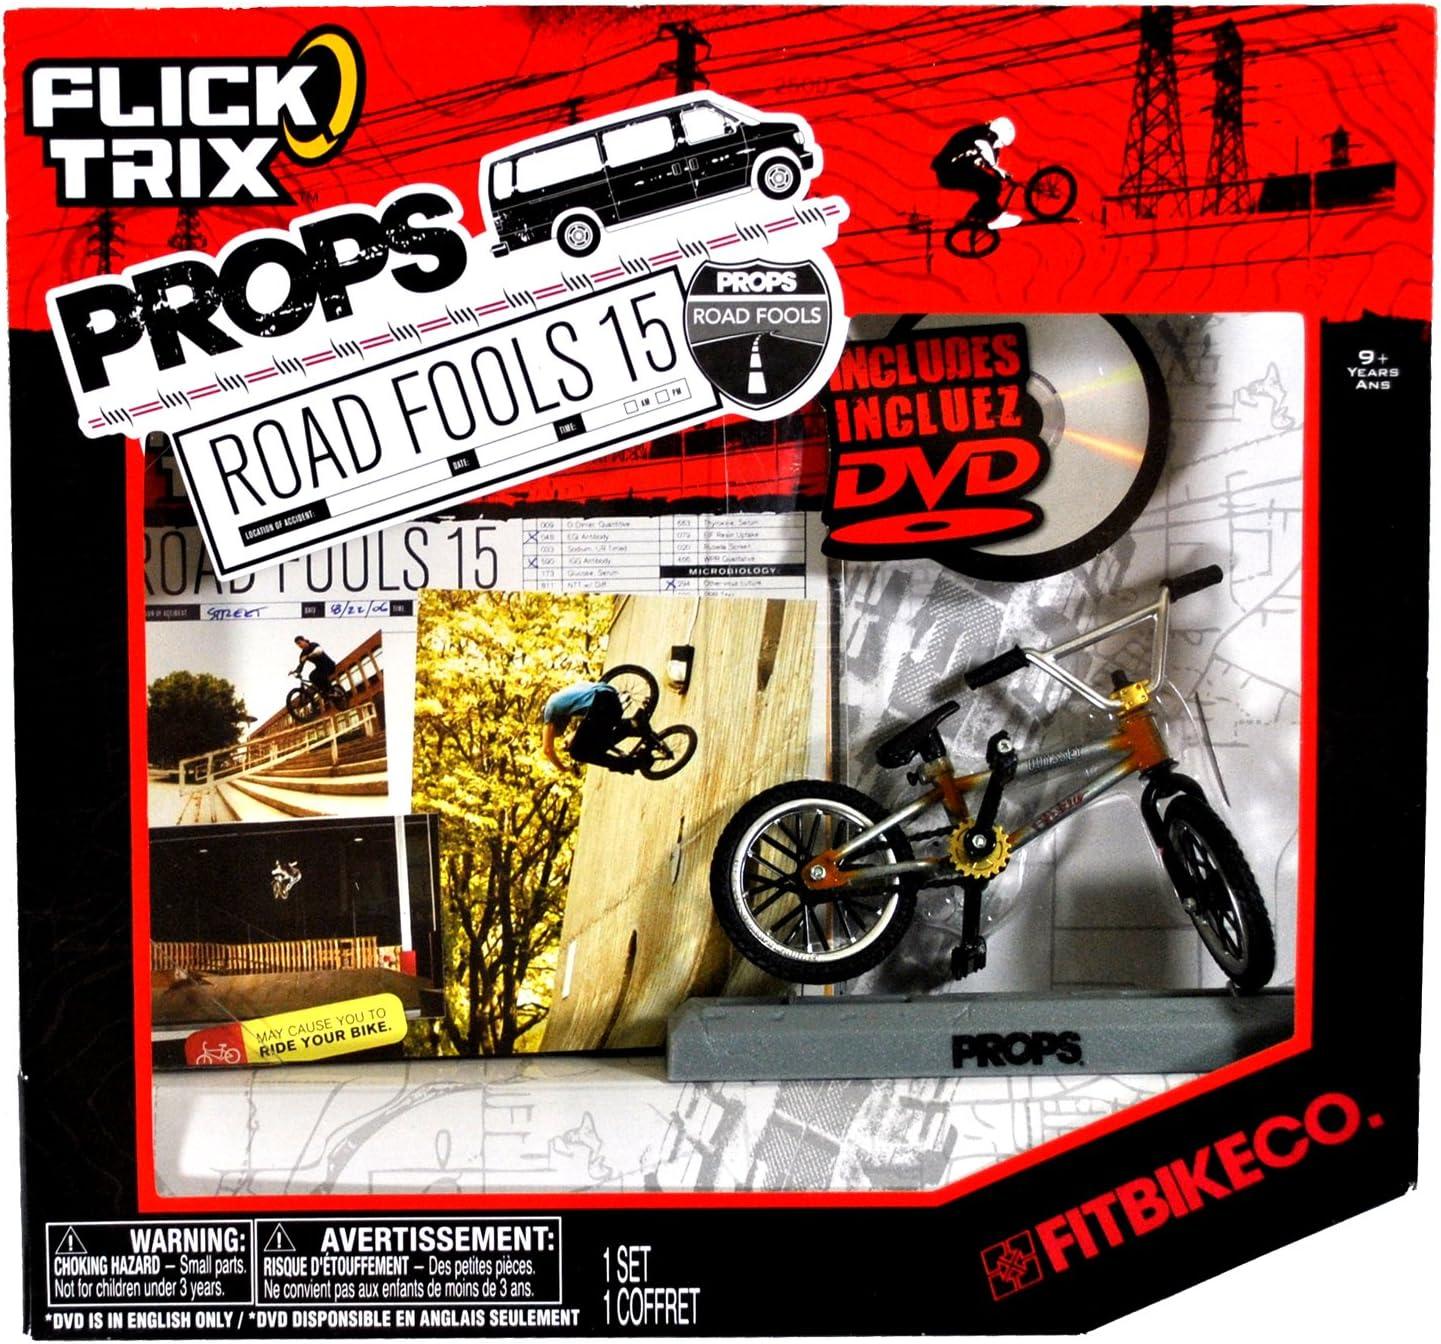 Metal Finger Bike Bicycle Mini Fingerbike Model w// Tires Tools Boys Toy Game